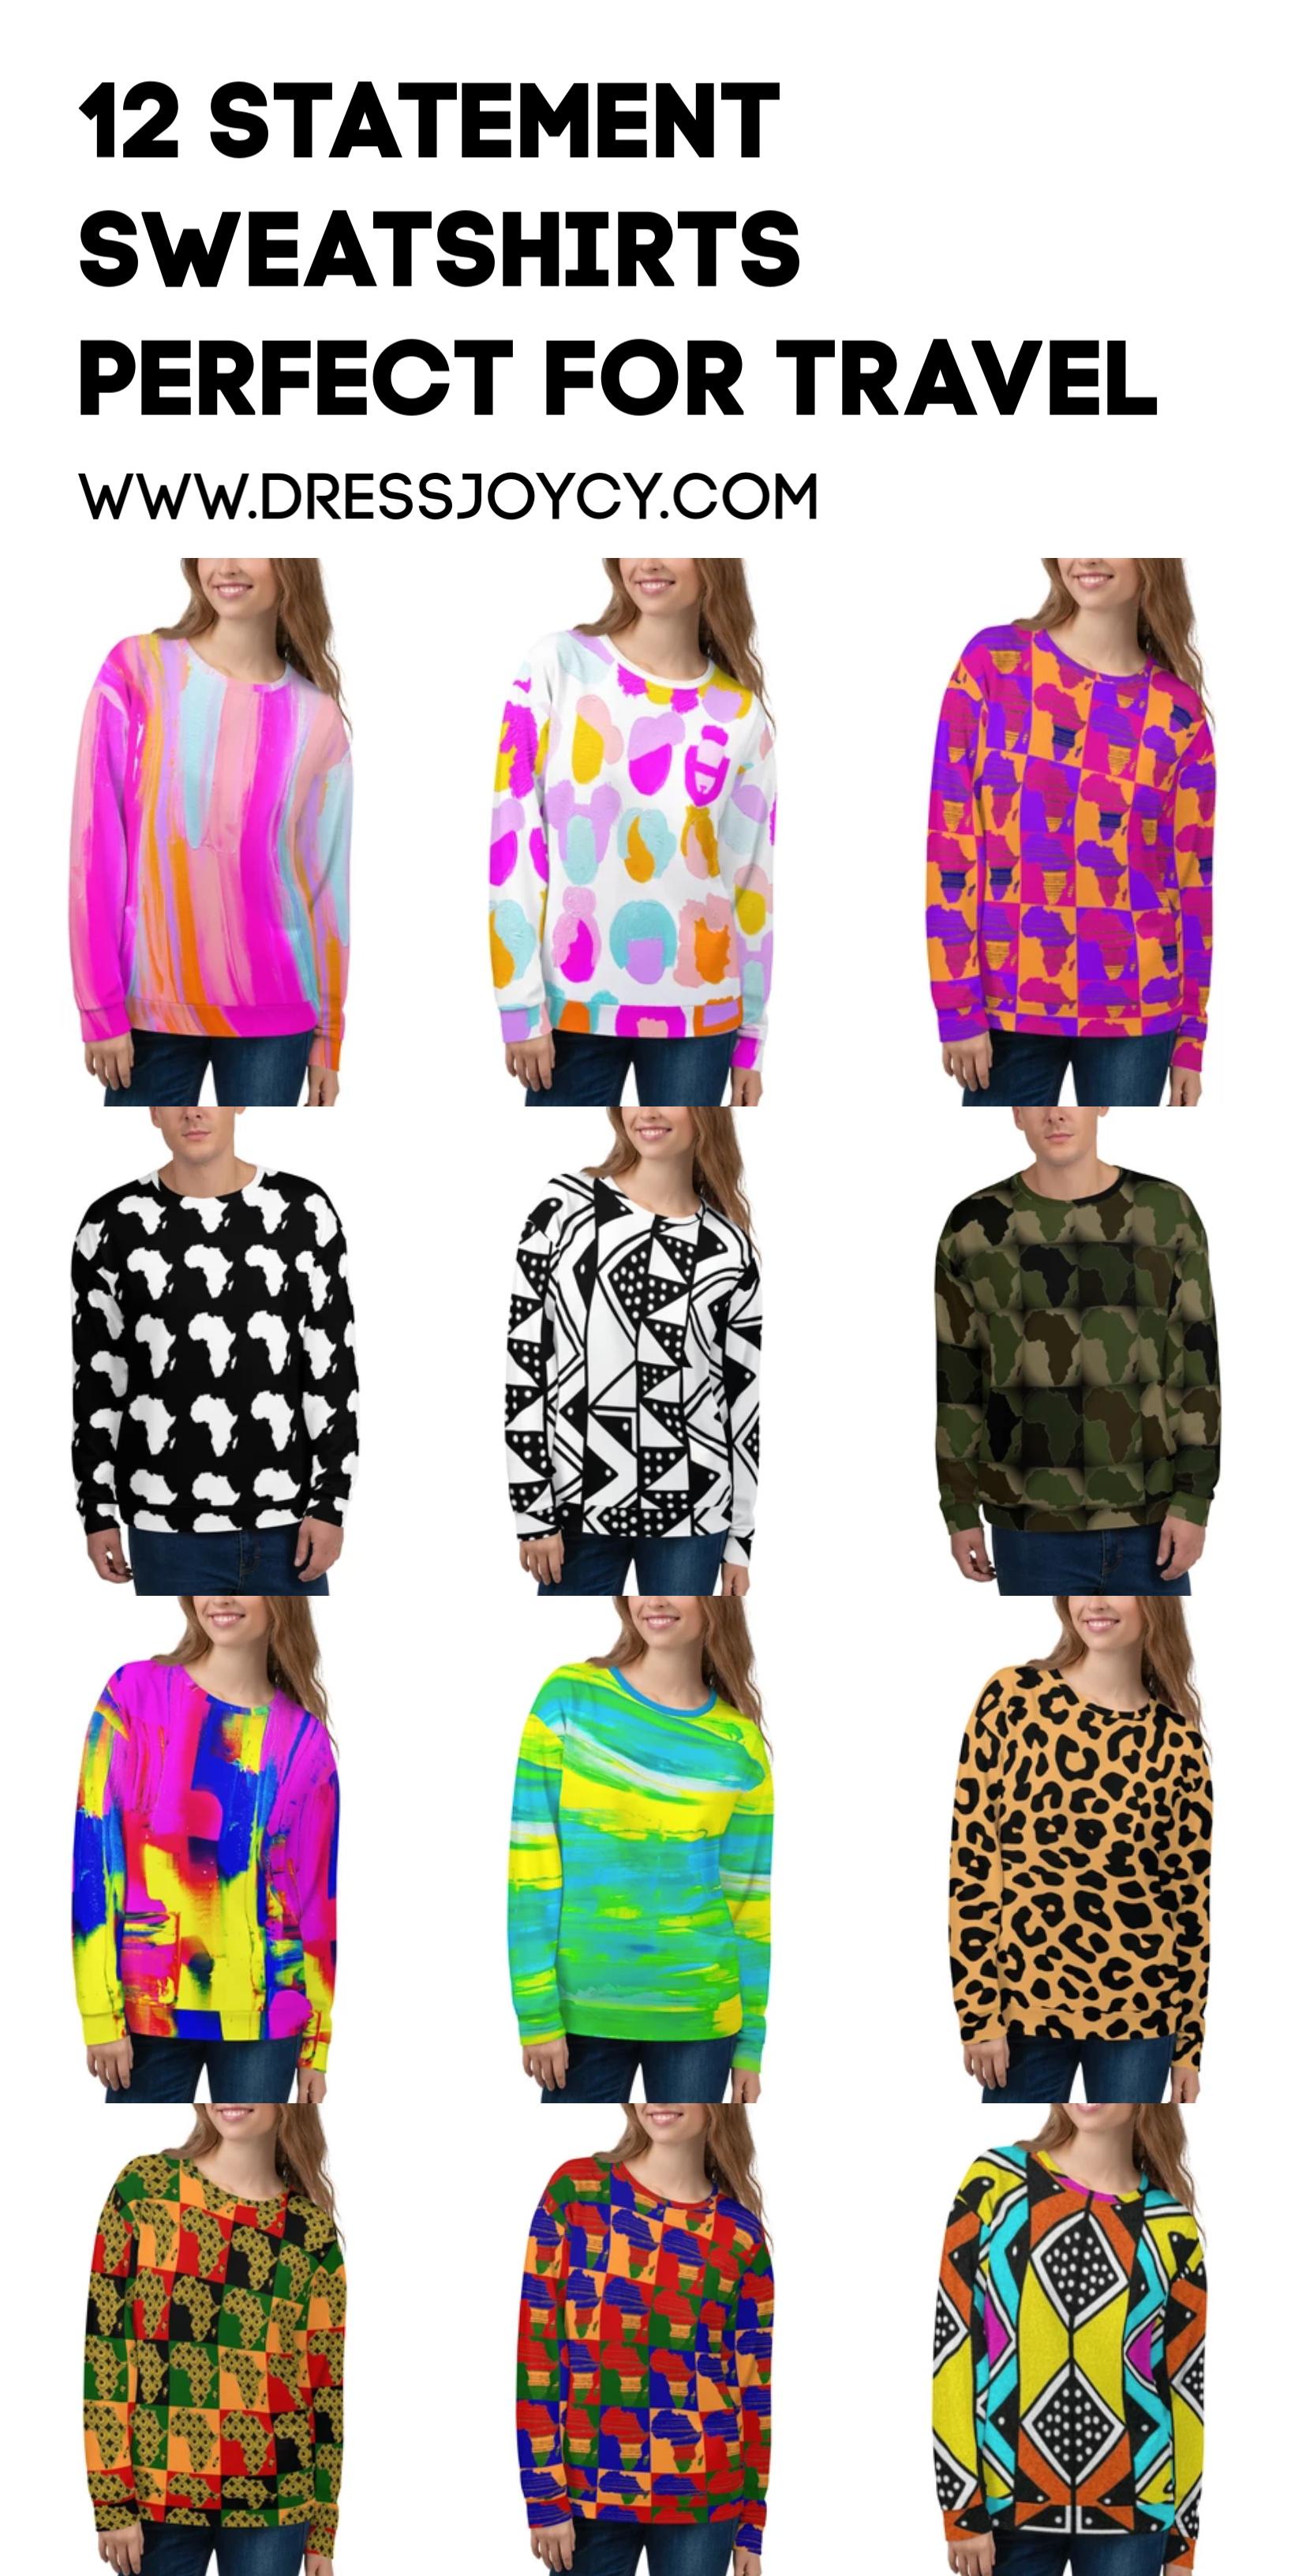 12 Statement Sweatshirts Perfect for Travel | Dressjoycy.com